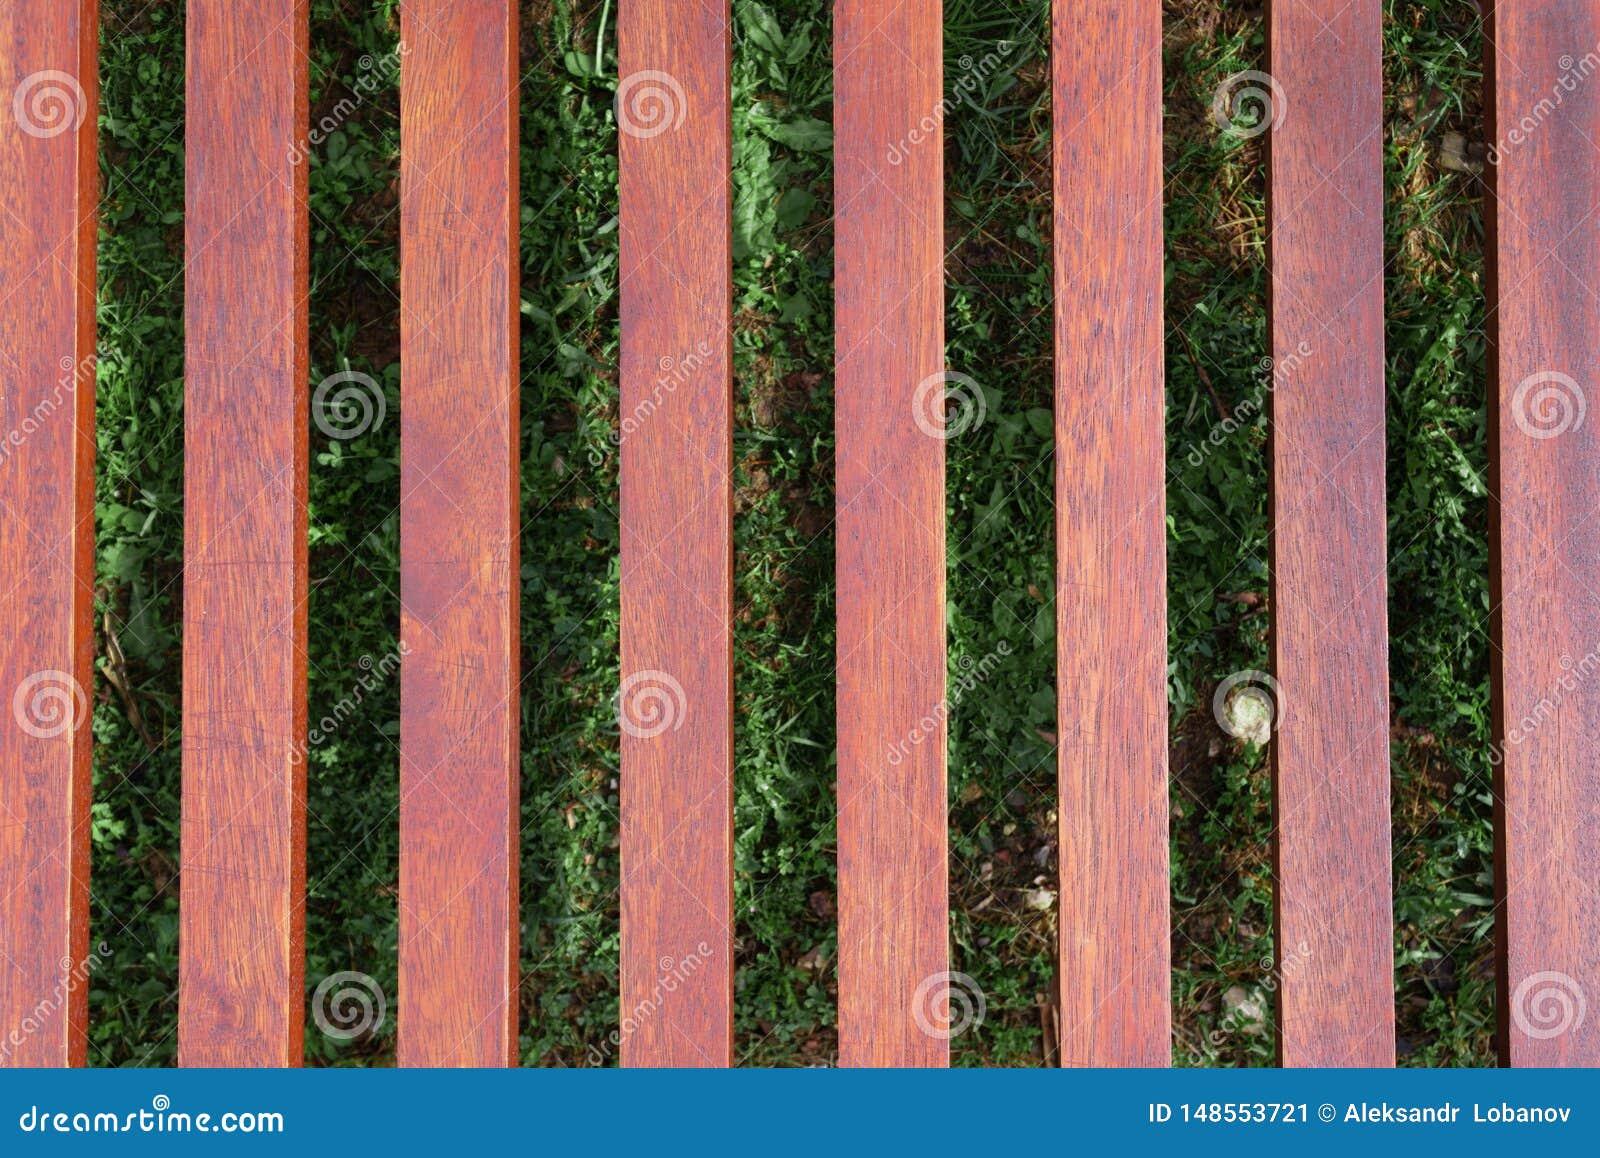 Drewniany lounger na tle zielona trawa